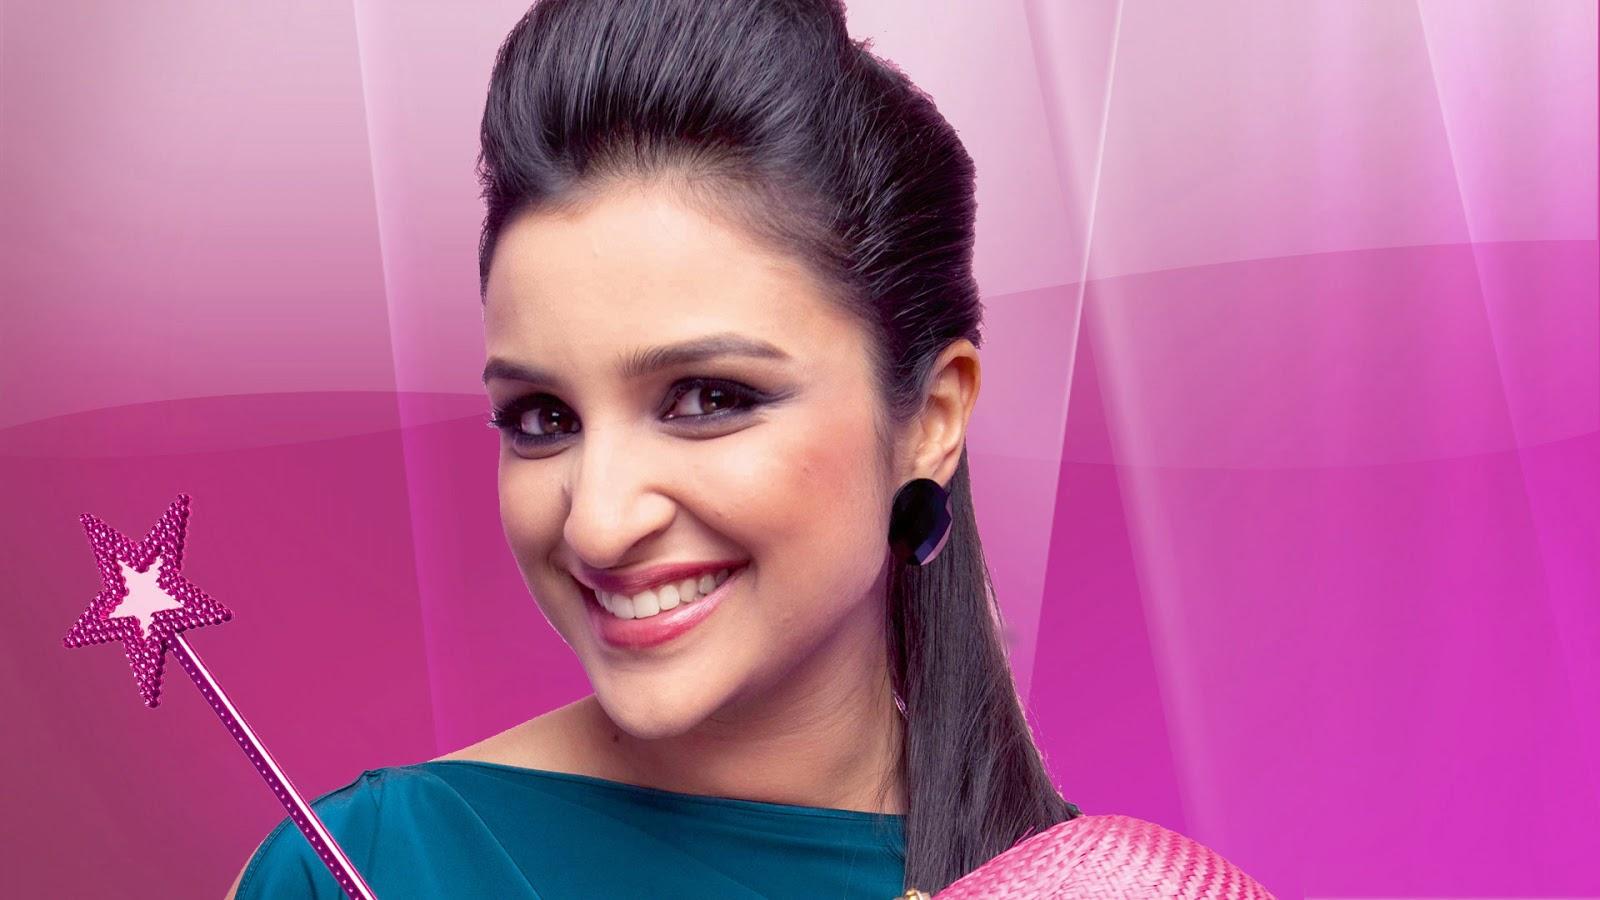 parineeti chopra cute smiling wallpaper